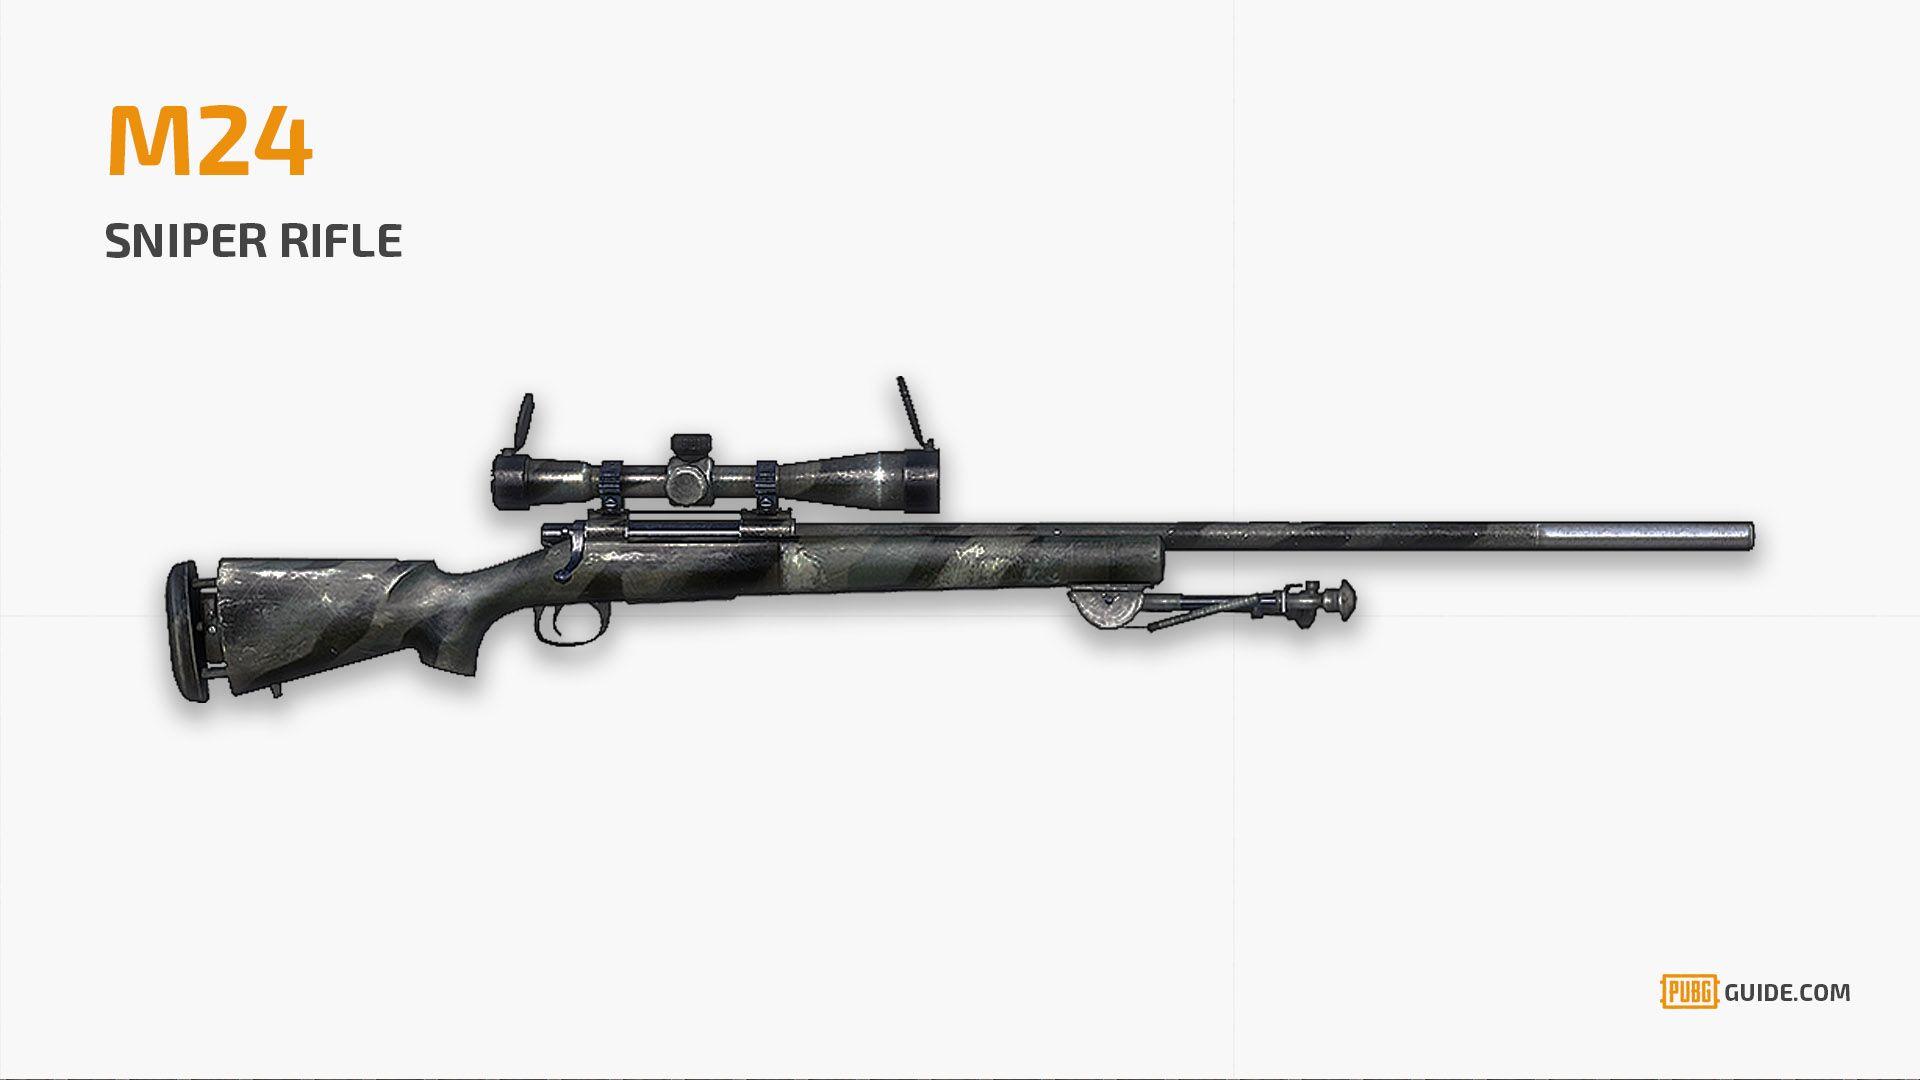 pubg m24, pubg wallpaper 4k, free pubg download, pubg sniper